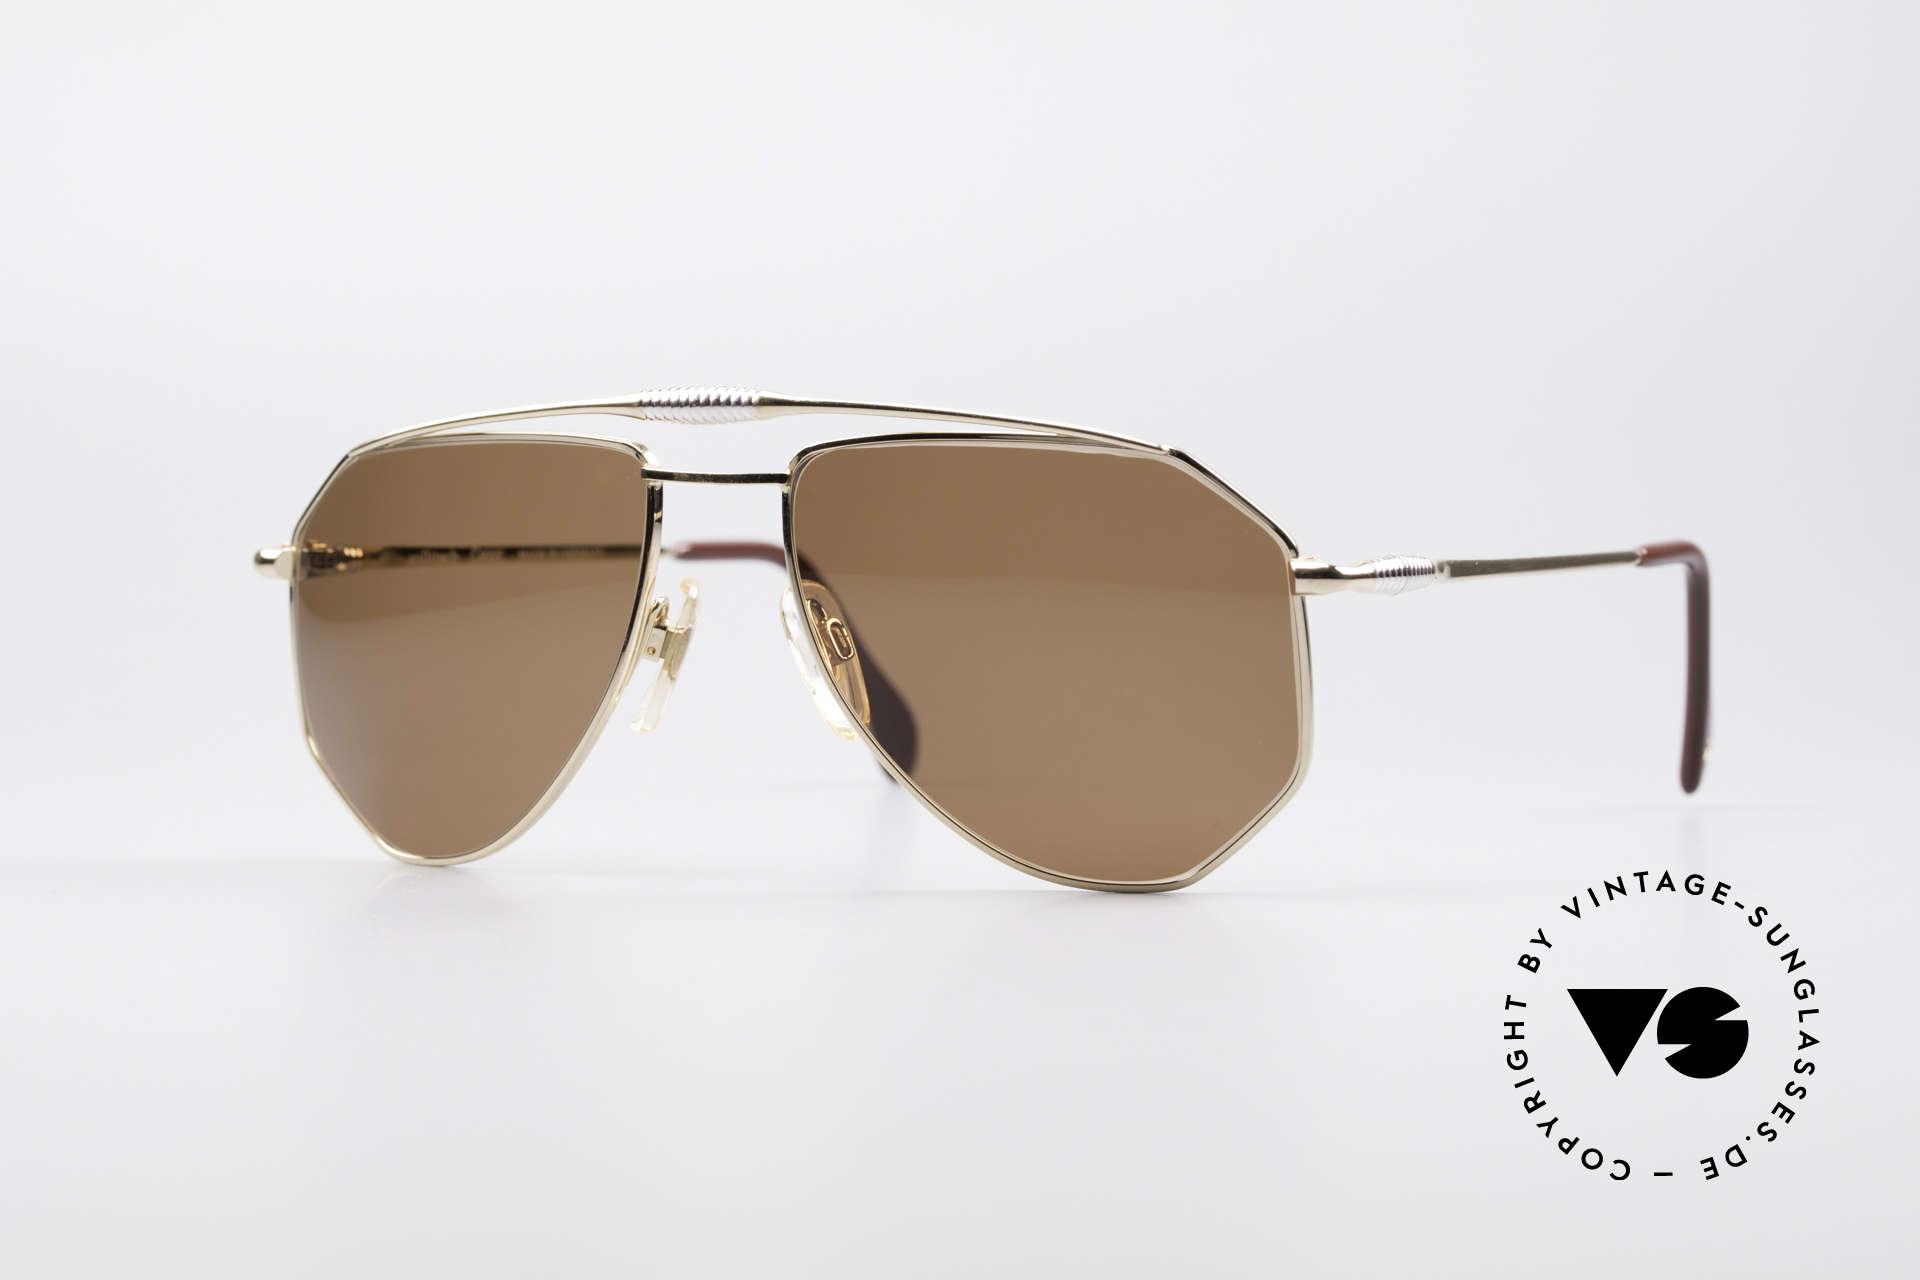 Zollitsch Cadre 120 Medium 80's Sunglasses, vintage Zollitsch designer sunglasses from the late 80's, Made for Men